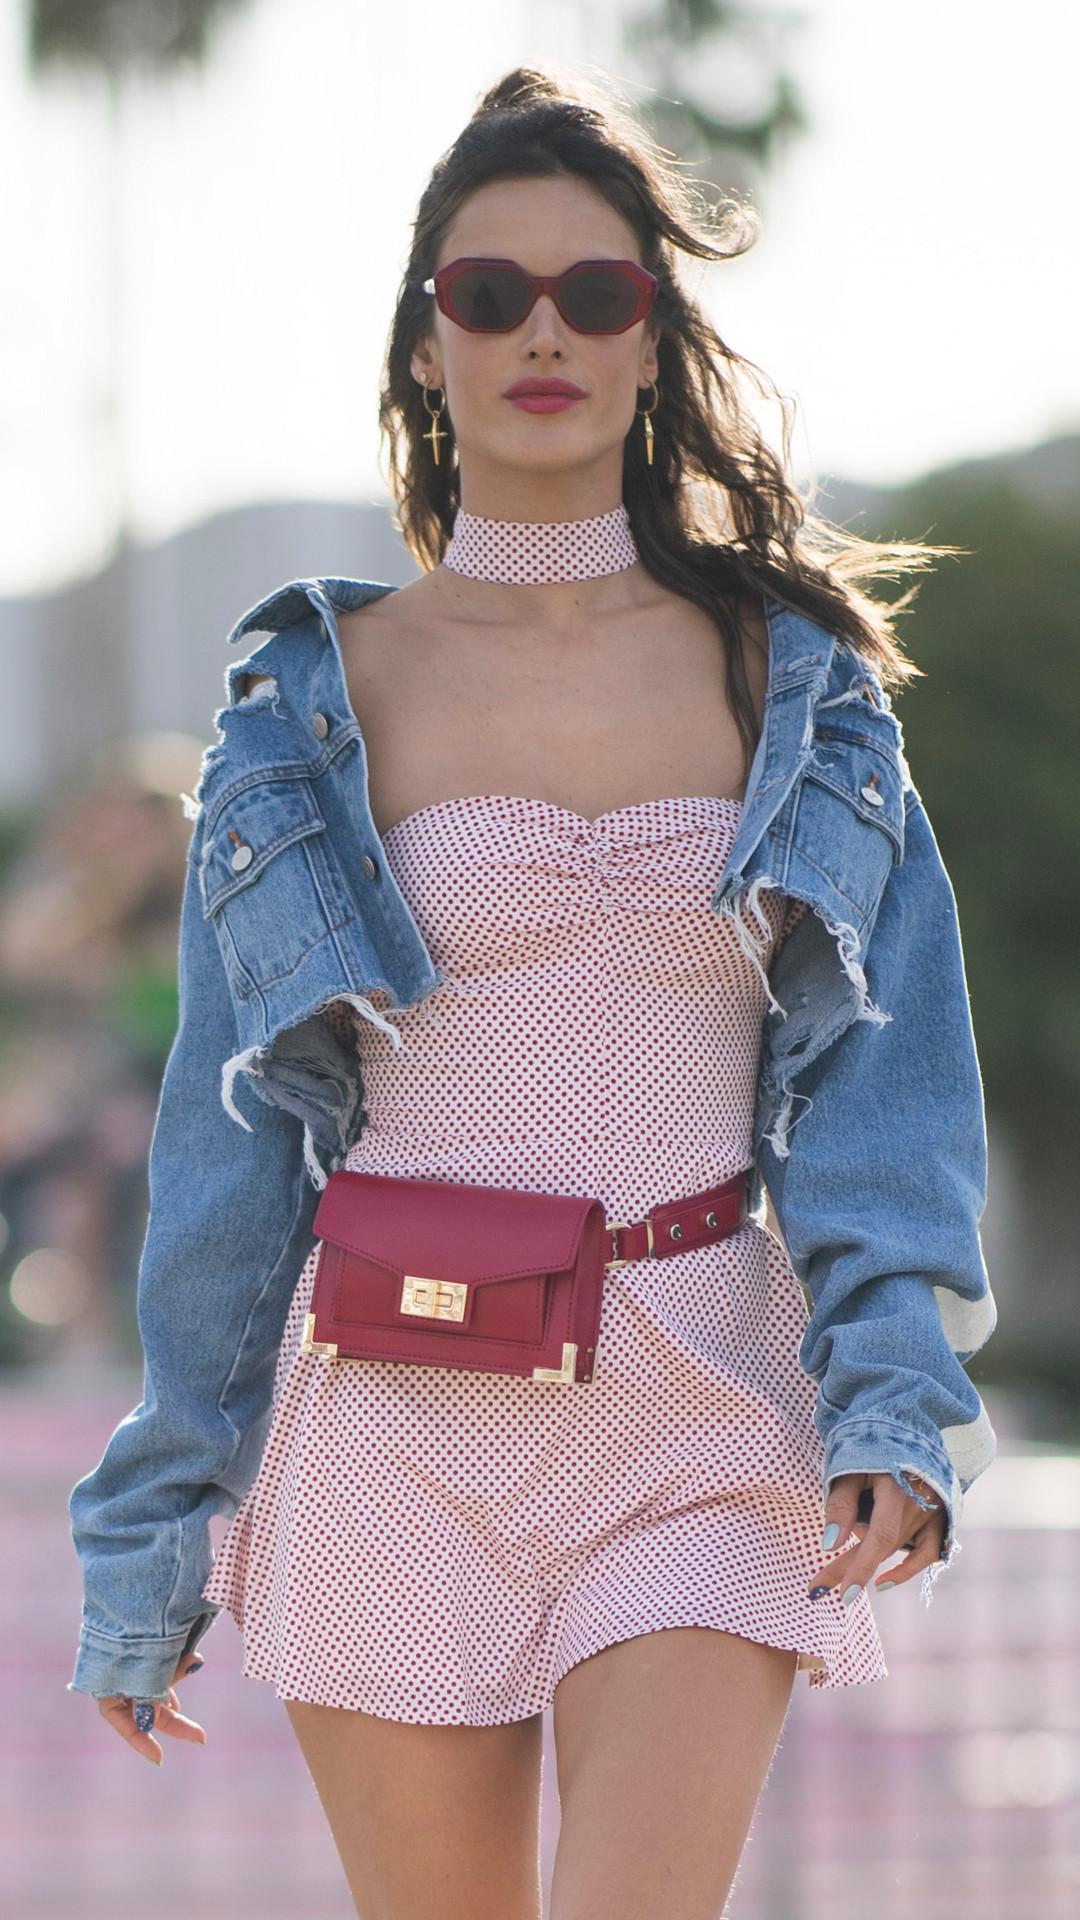 ESC: Coachella Denim Trends, Alessandra Ambrosio